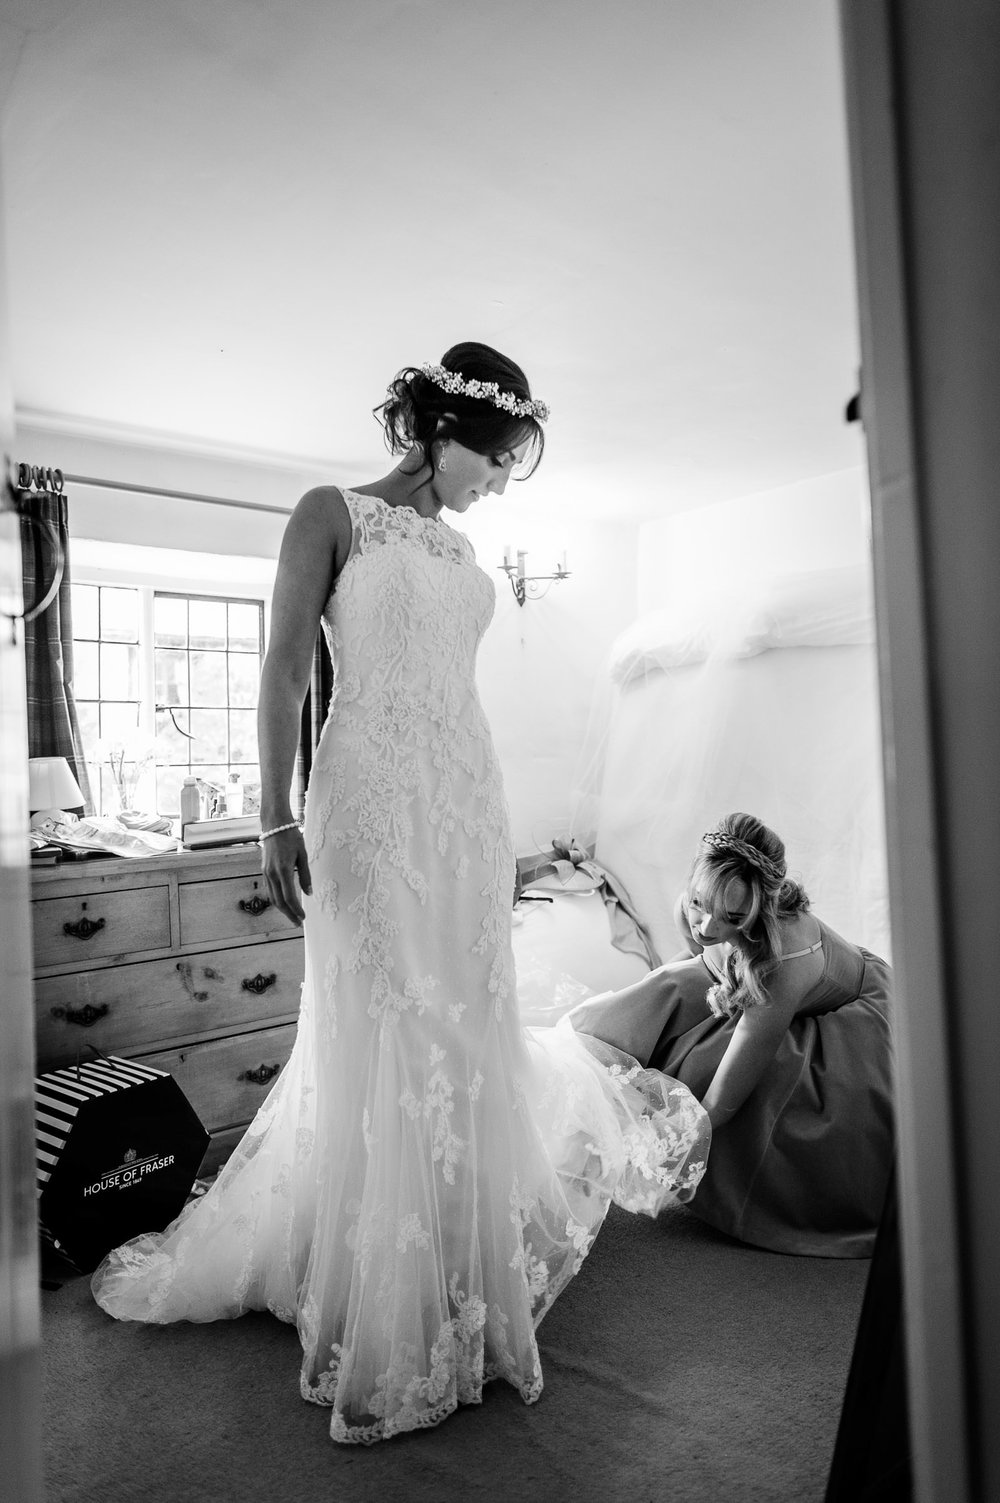 Notley Tythe Barn Reportage Wedding Photos 003.jpg